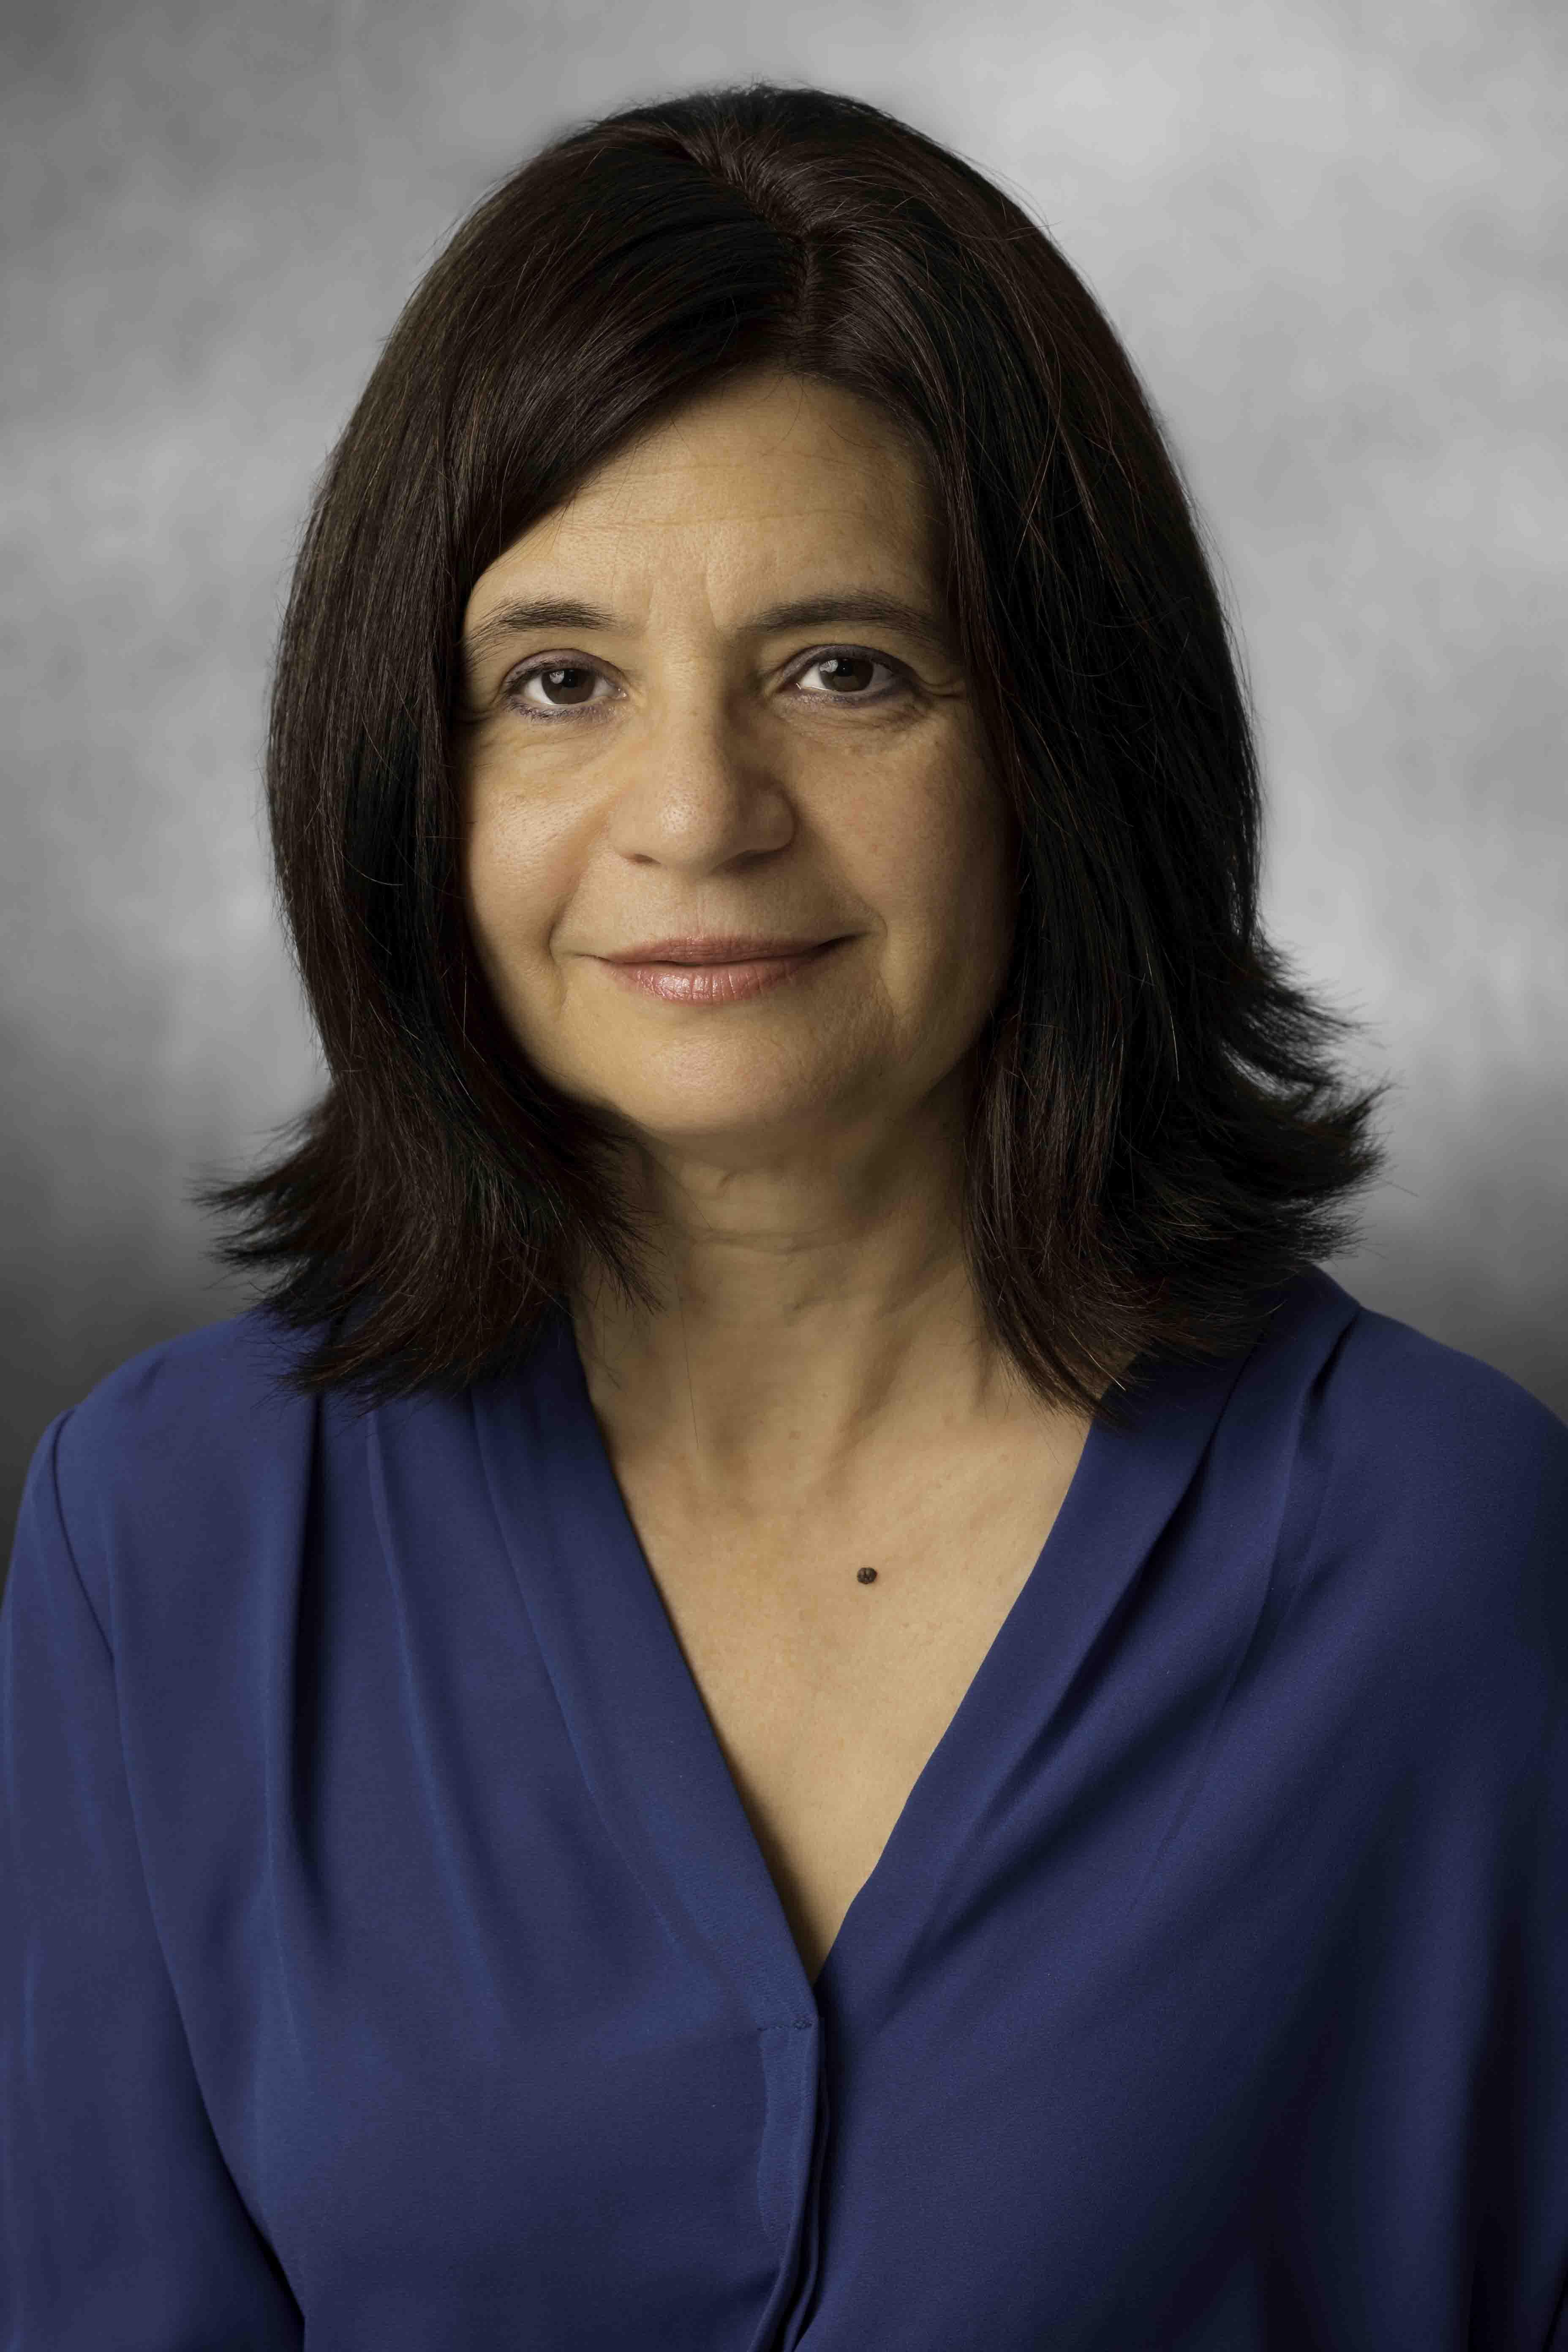 Maria Zayas, Ed.D., a psychologist in Cumming, GA